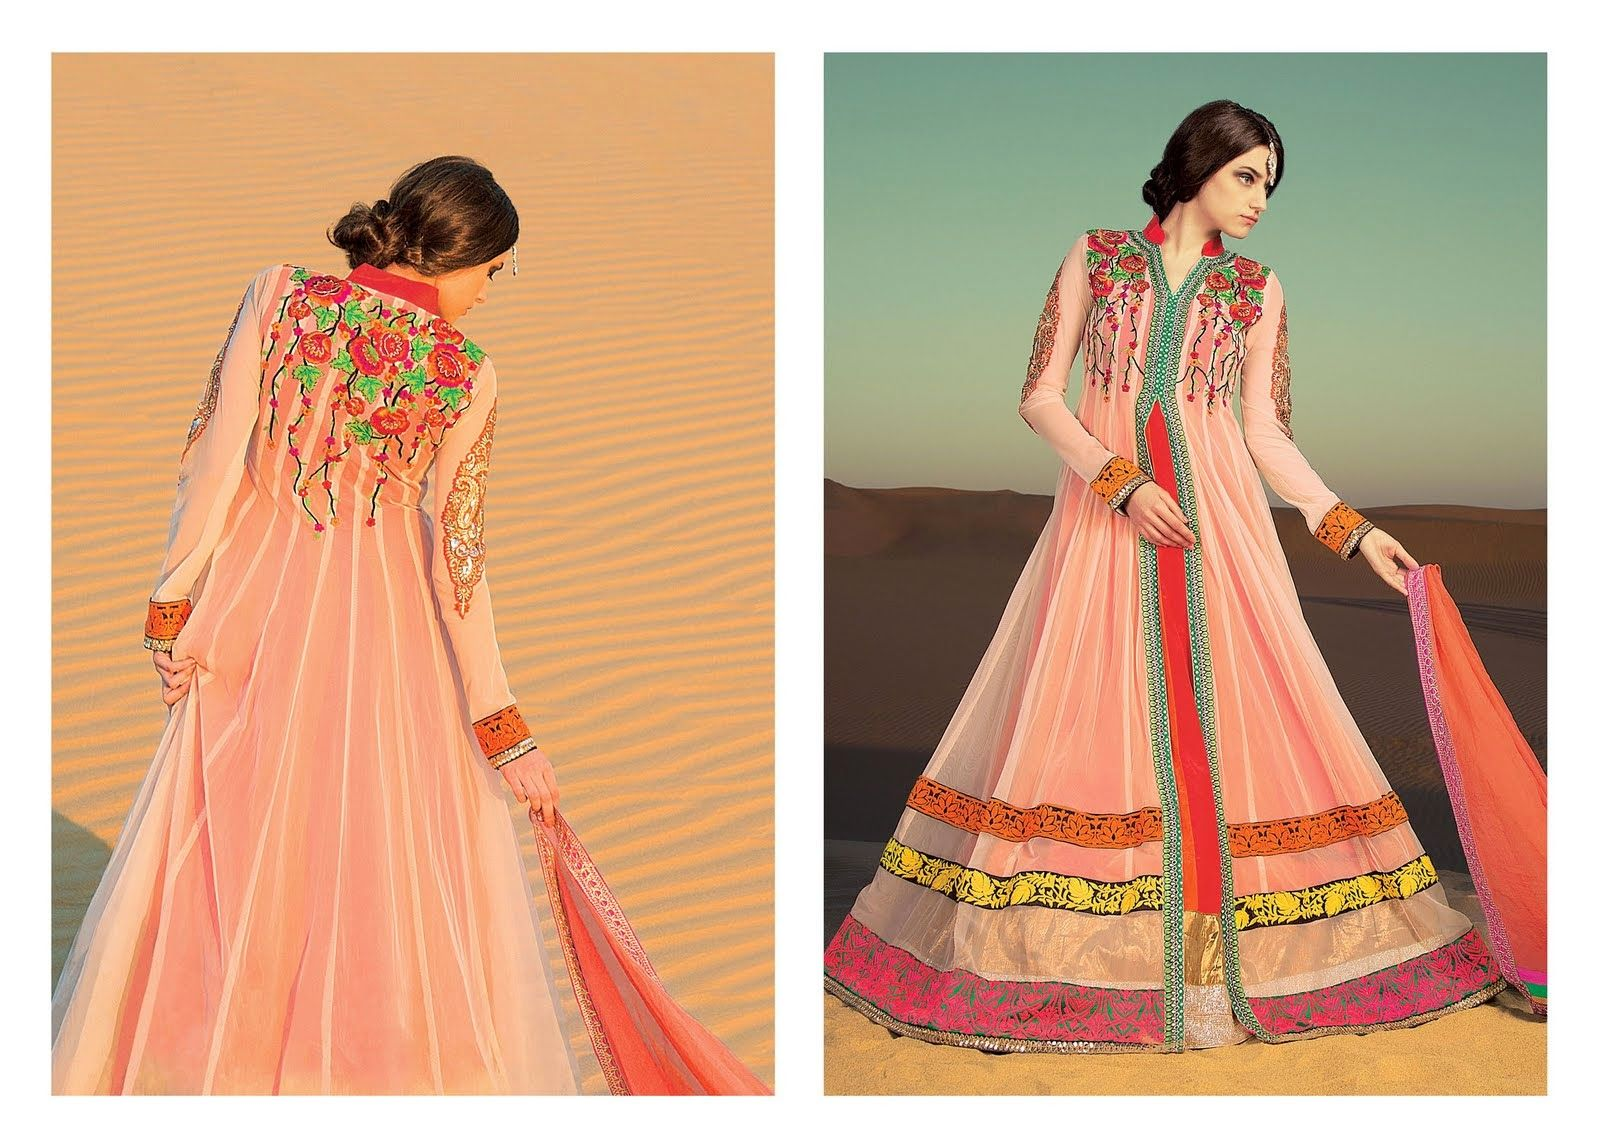 Ksl wedding dress  KSLMasranga Price BDT  only  Salwar Kamiz  Pinterest  Kamiz